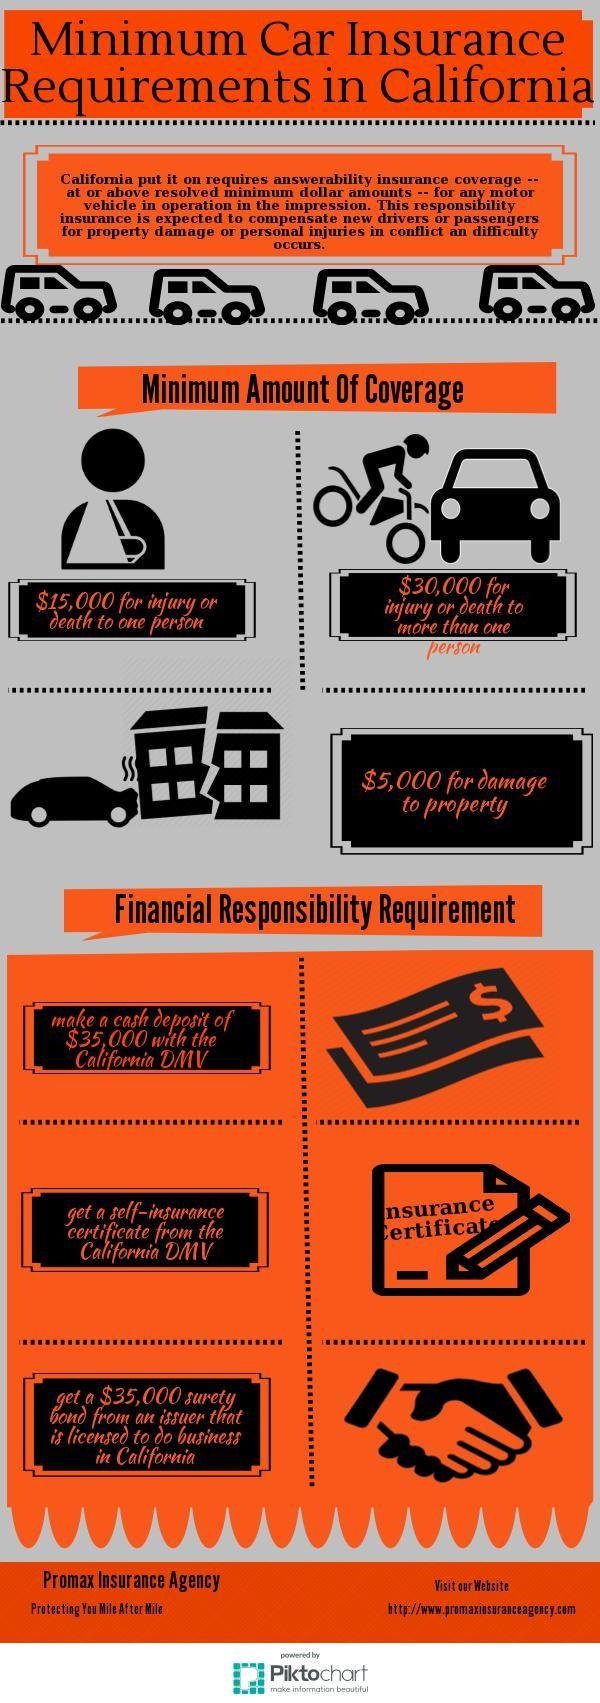 Life Insurance Quotes California Auto Insurance In California  Piktochart Infographic Editor